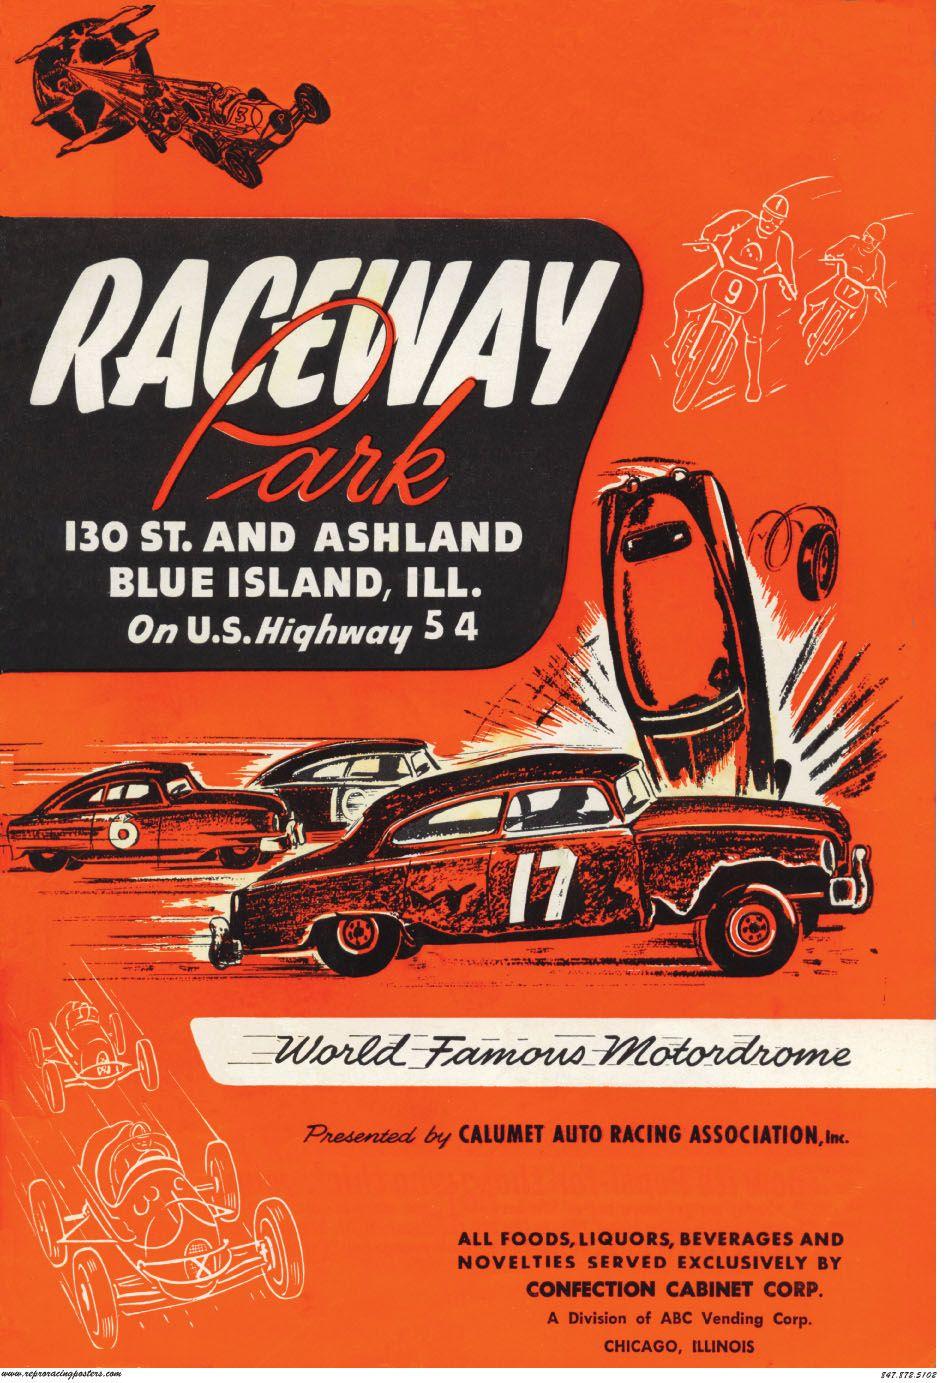 Raceway Park, Blue Island, Ill. | Poster | Pinterest | Car posters ...